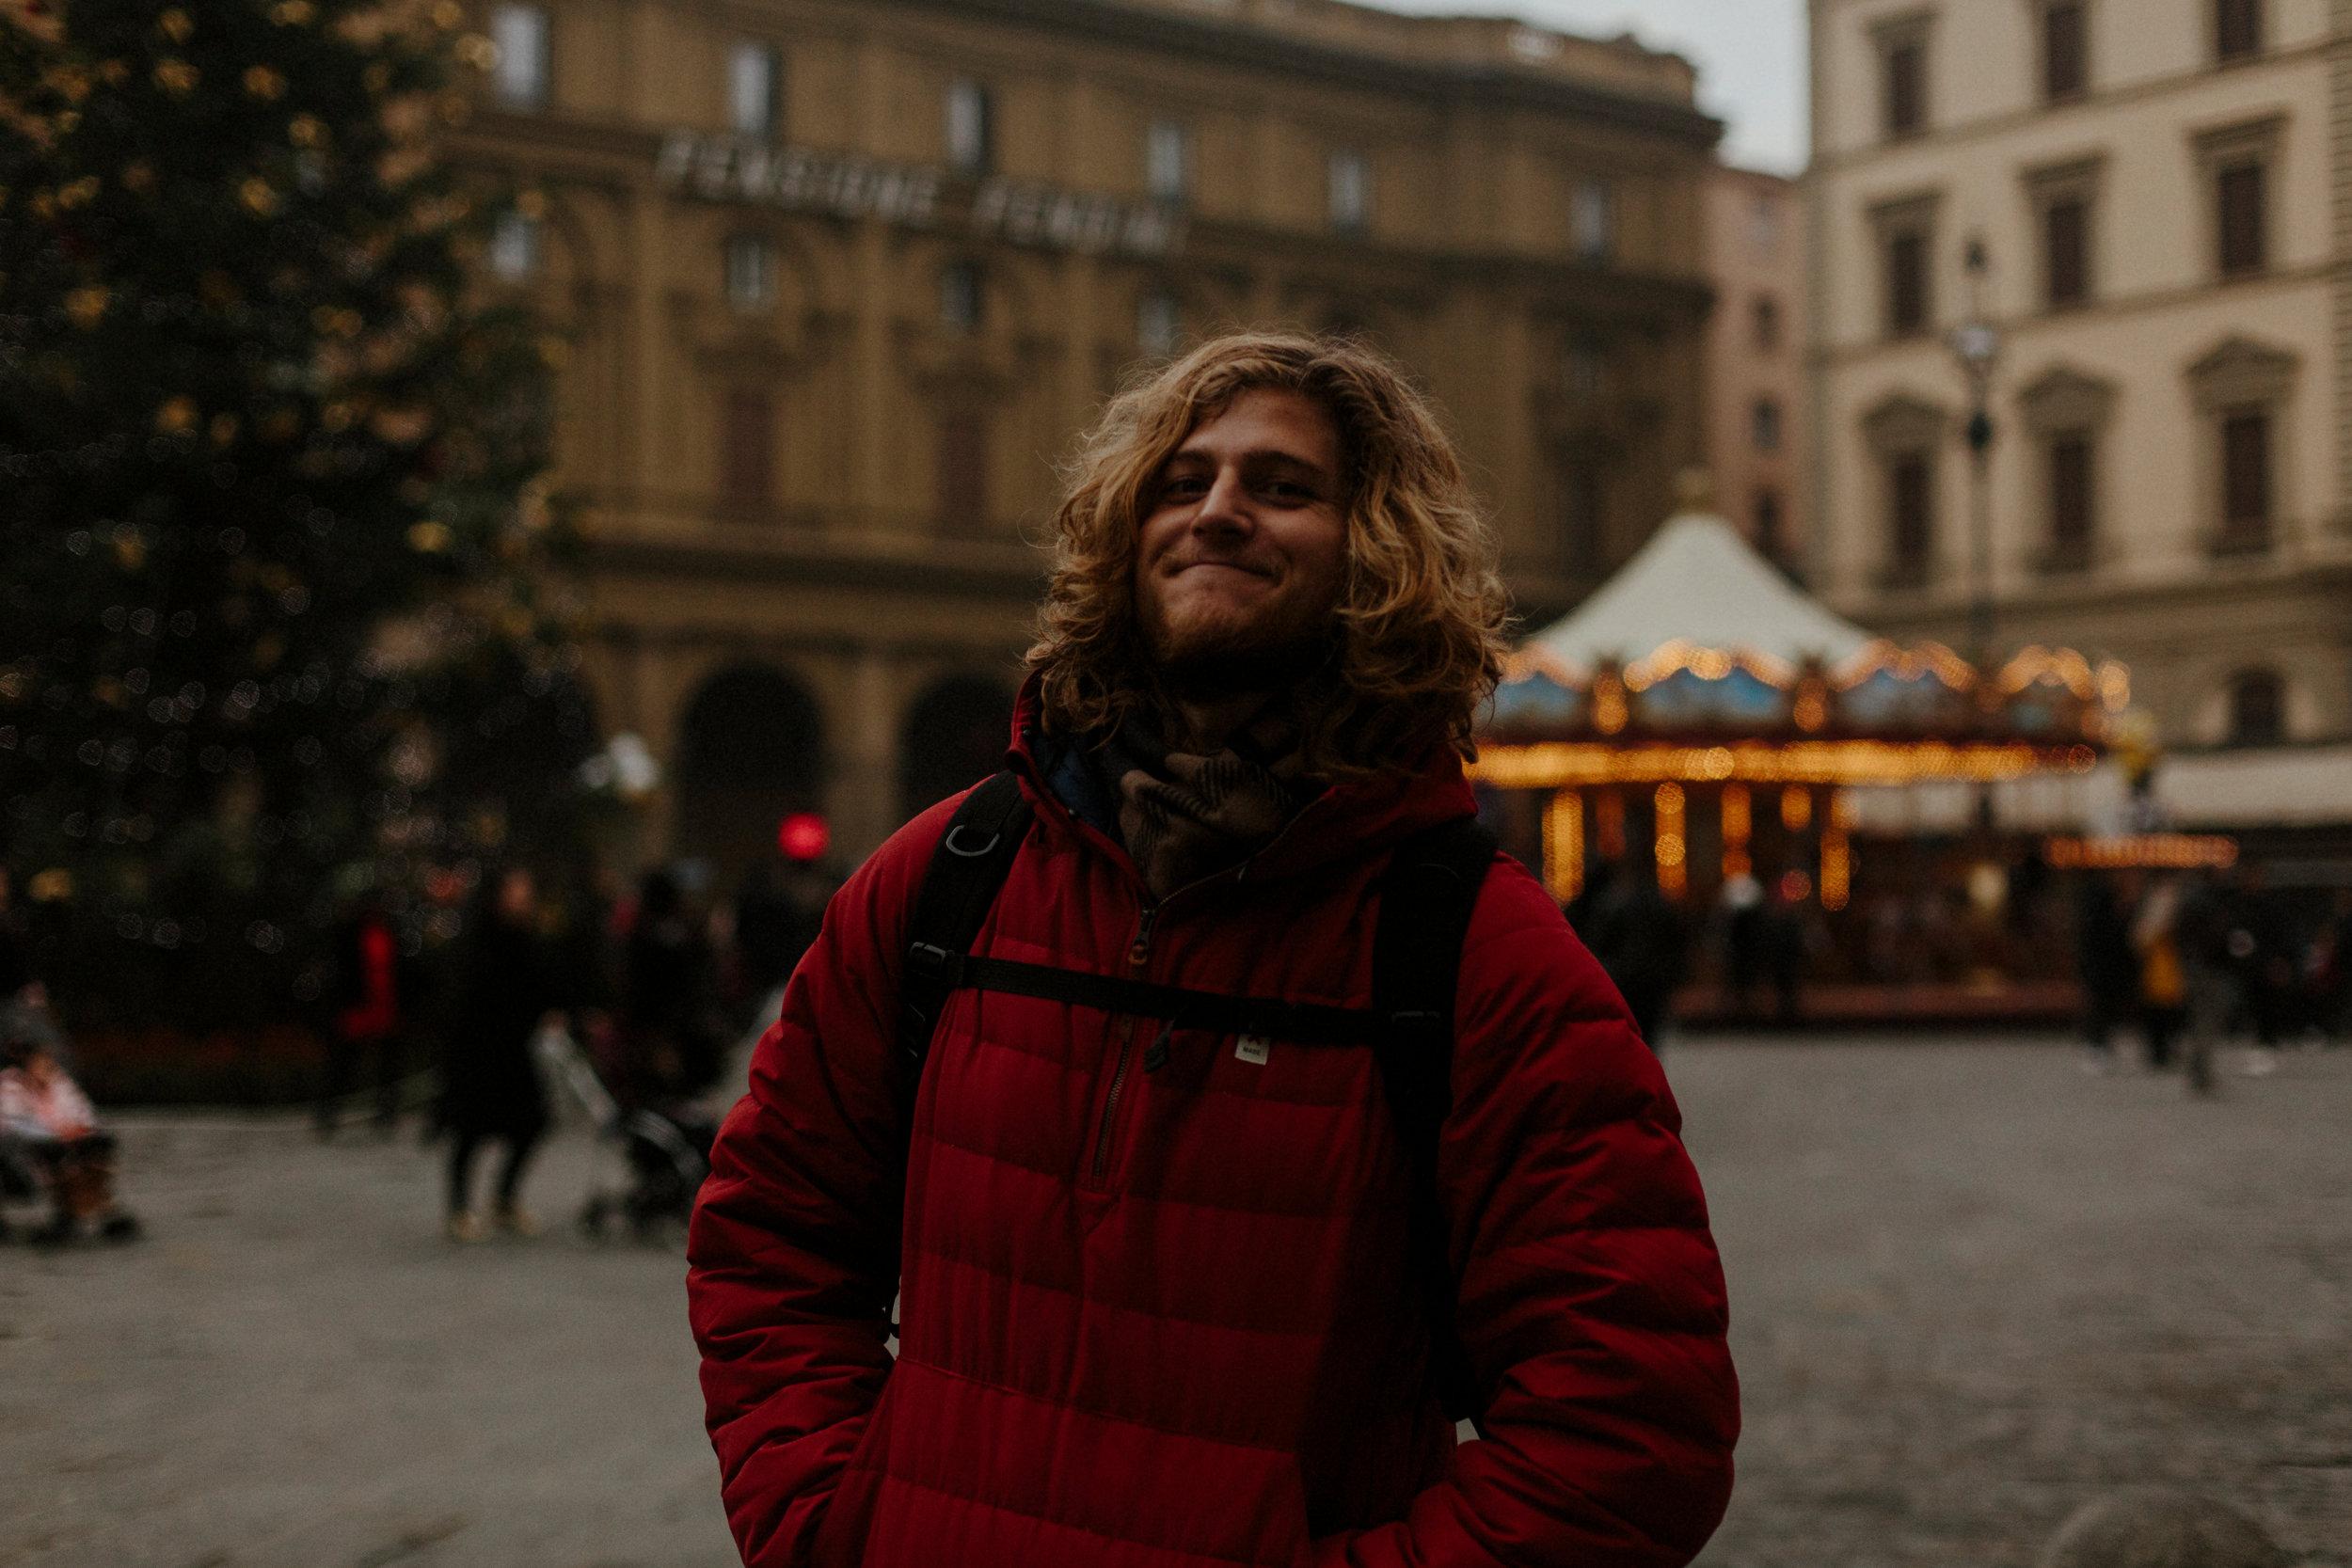 Italy Happily Shavers Website-67Italy Happily Shavers Website Grain.jpg